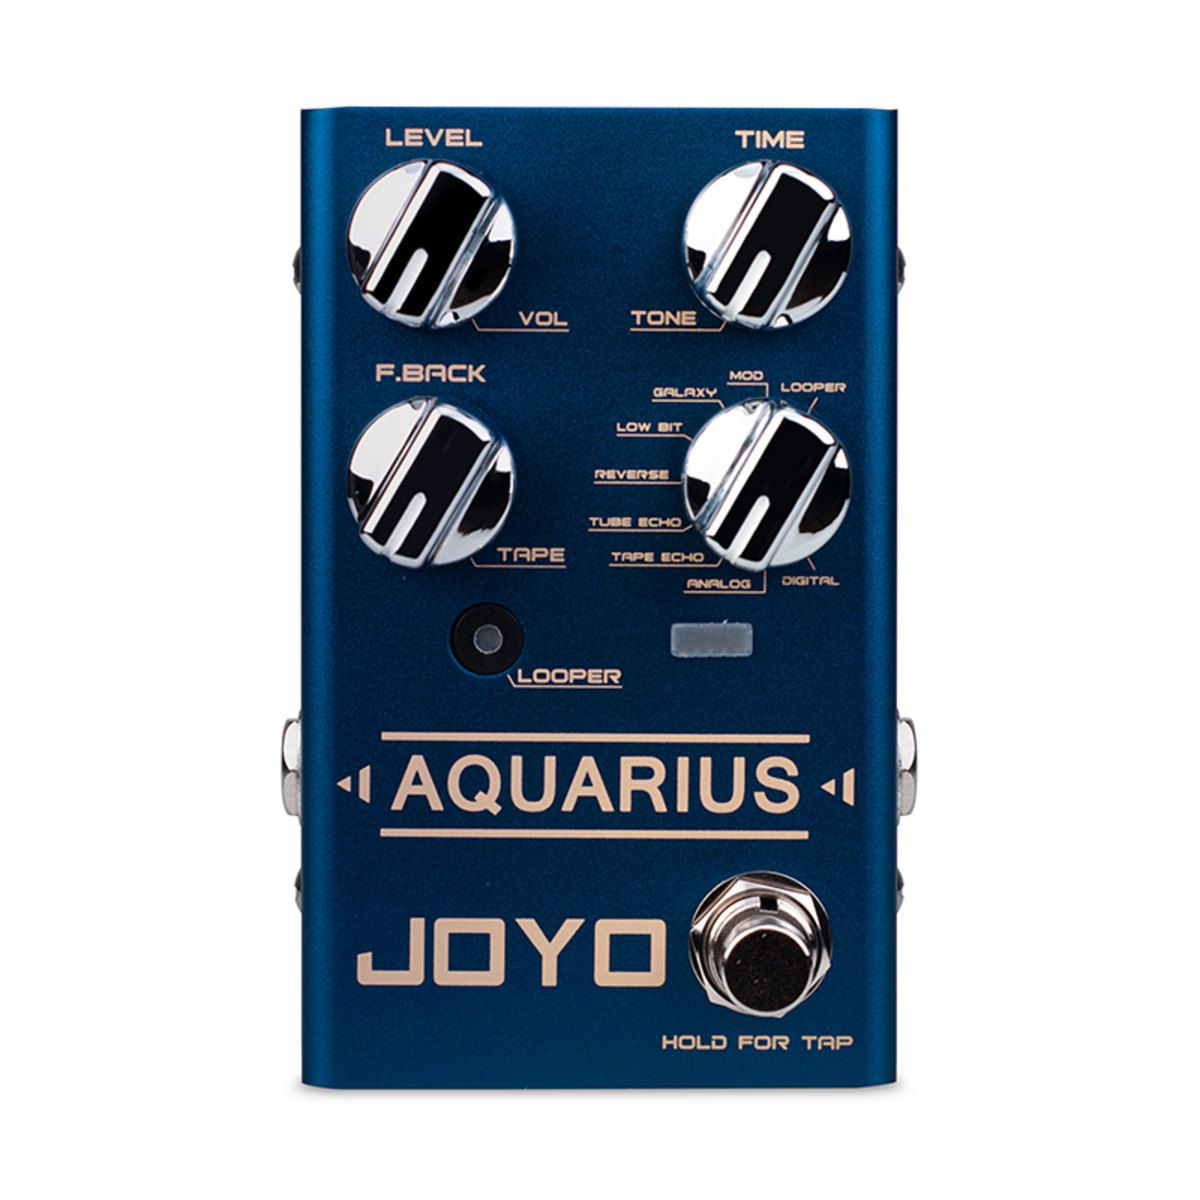 Pedal JOYO multi-model delay Aquarius